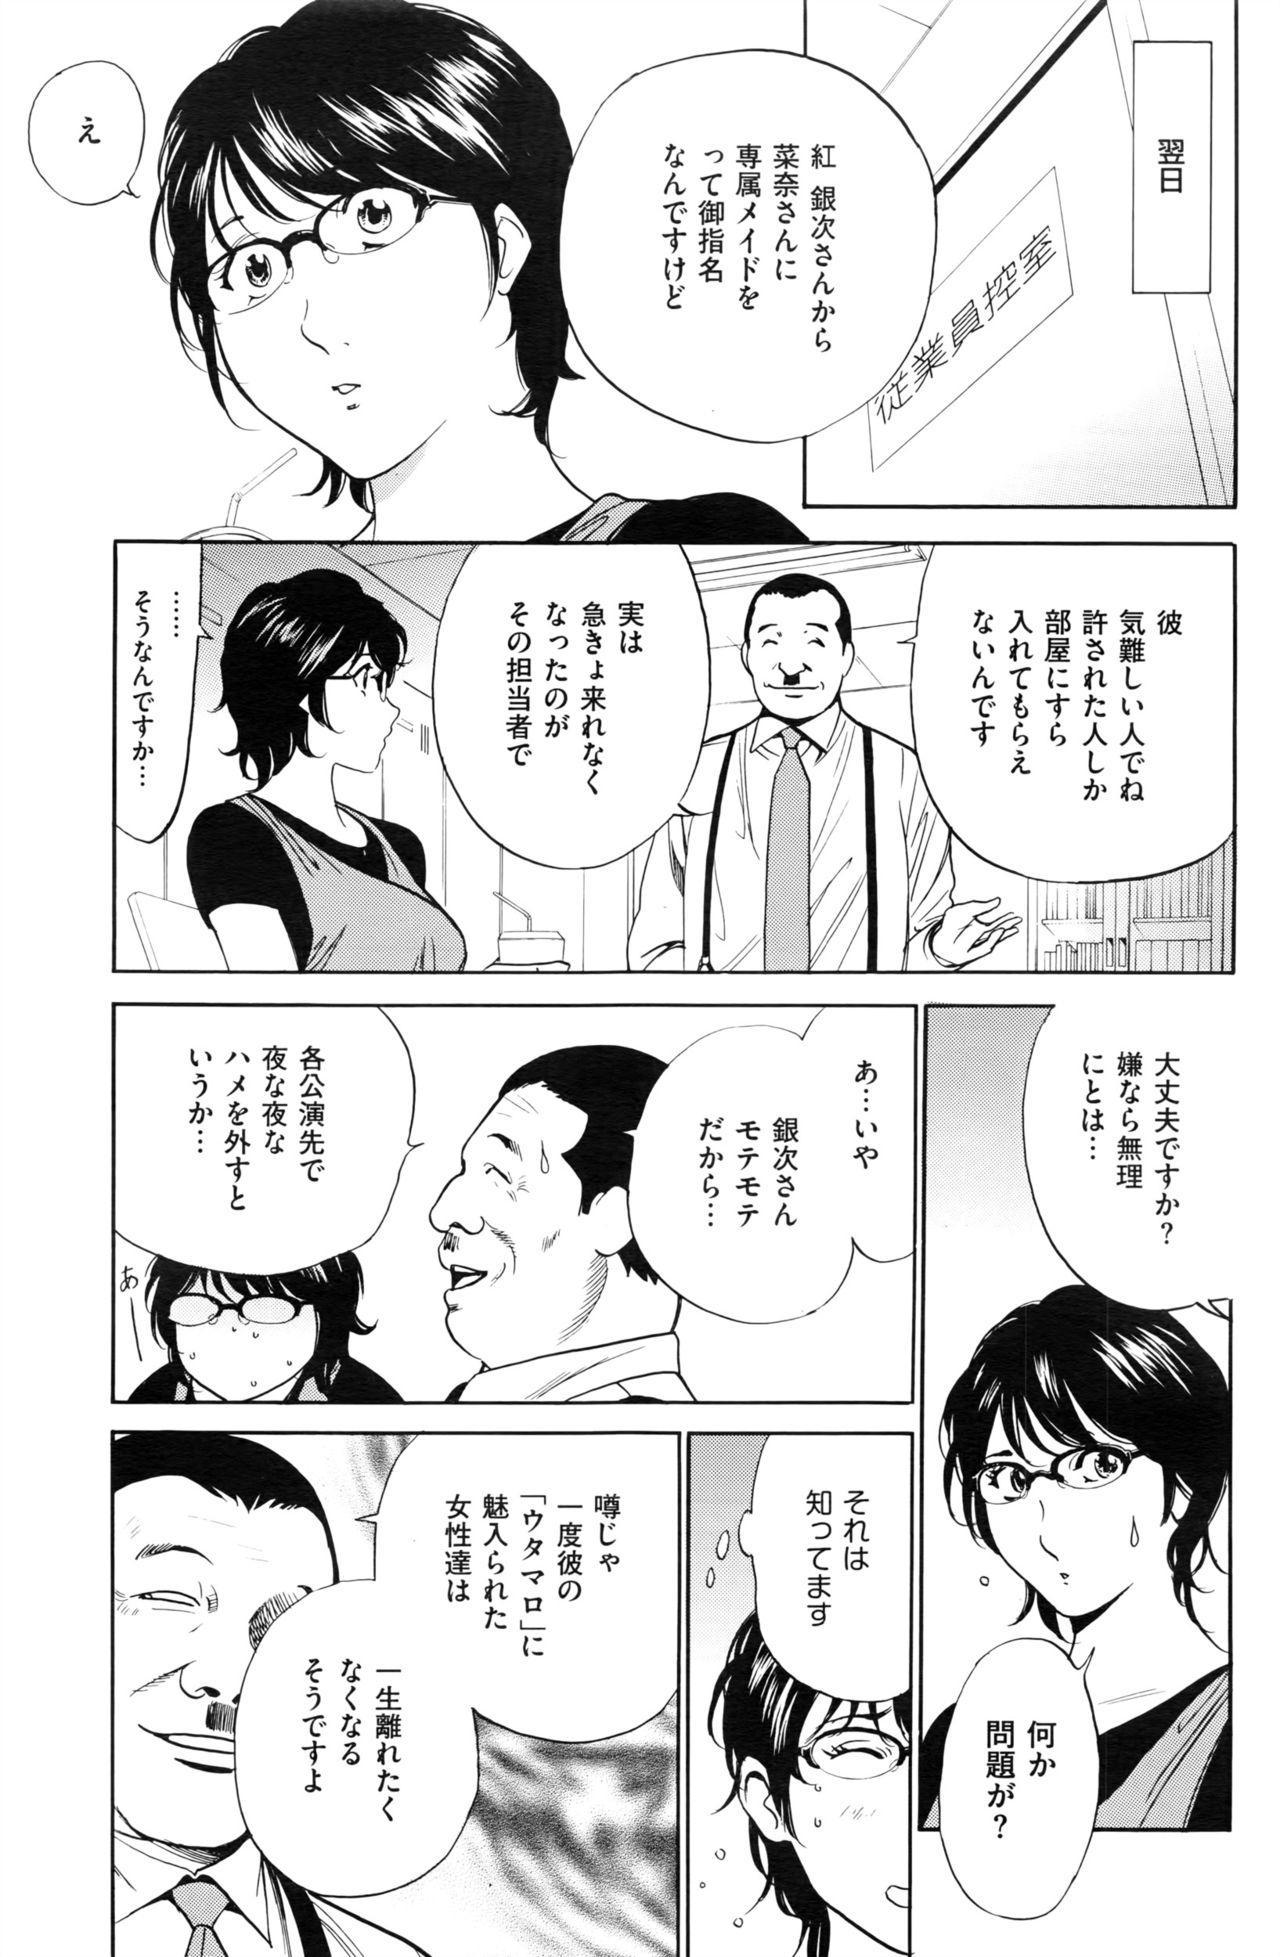 Wa Usuki Ipa a 1-10 63